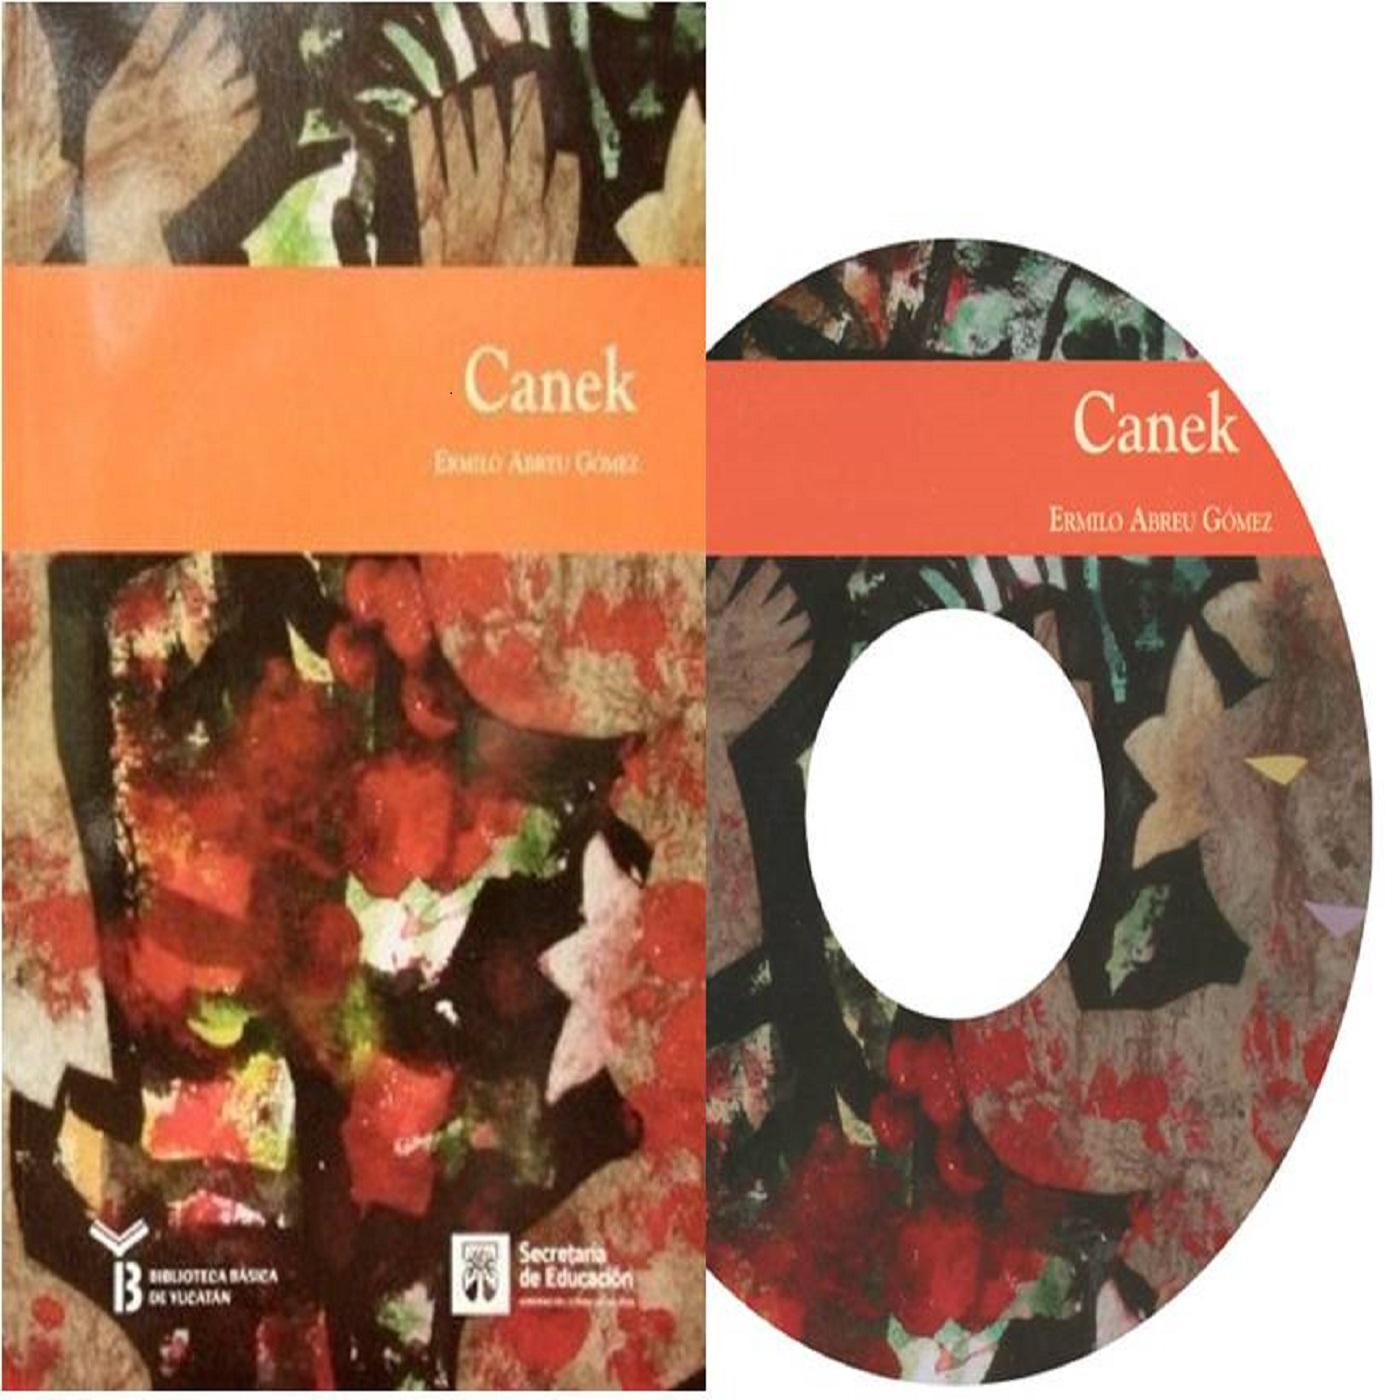 Audio libro Canek